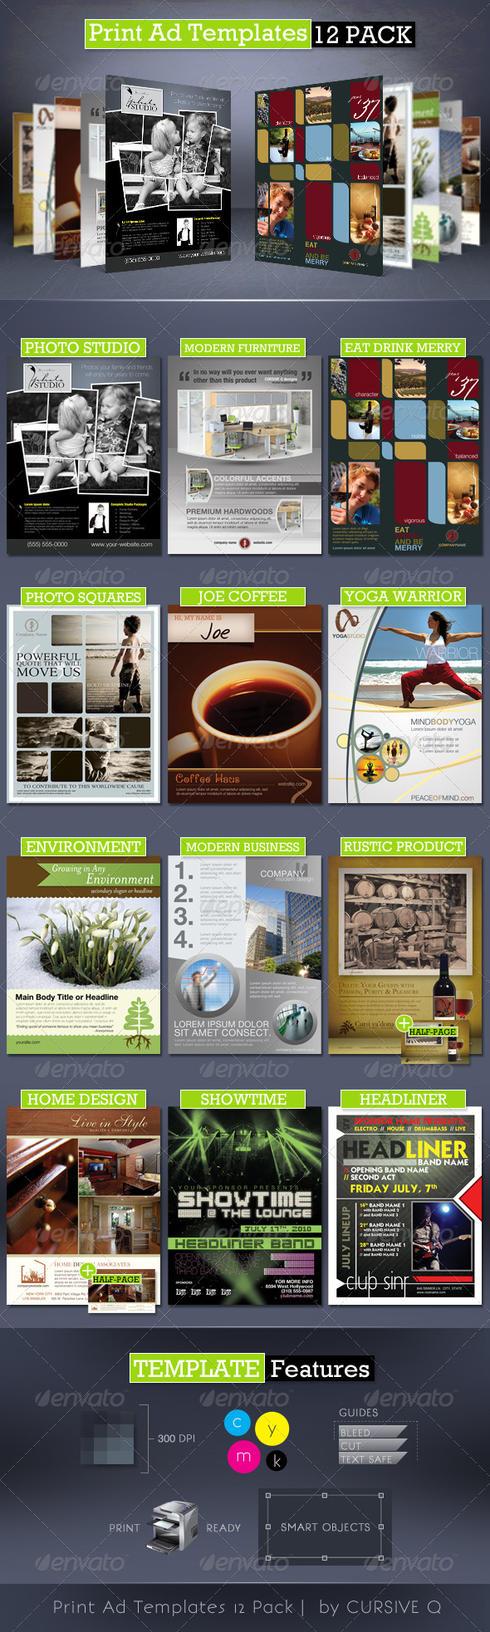 Print Ad Templates 12 Pack by CursiveQ-Designs